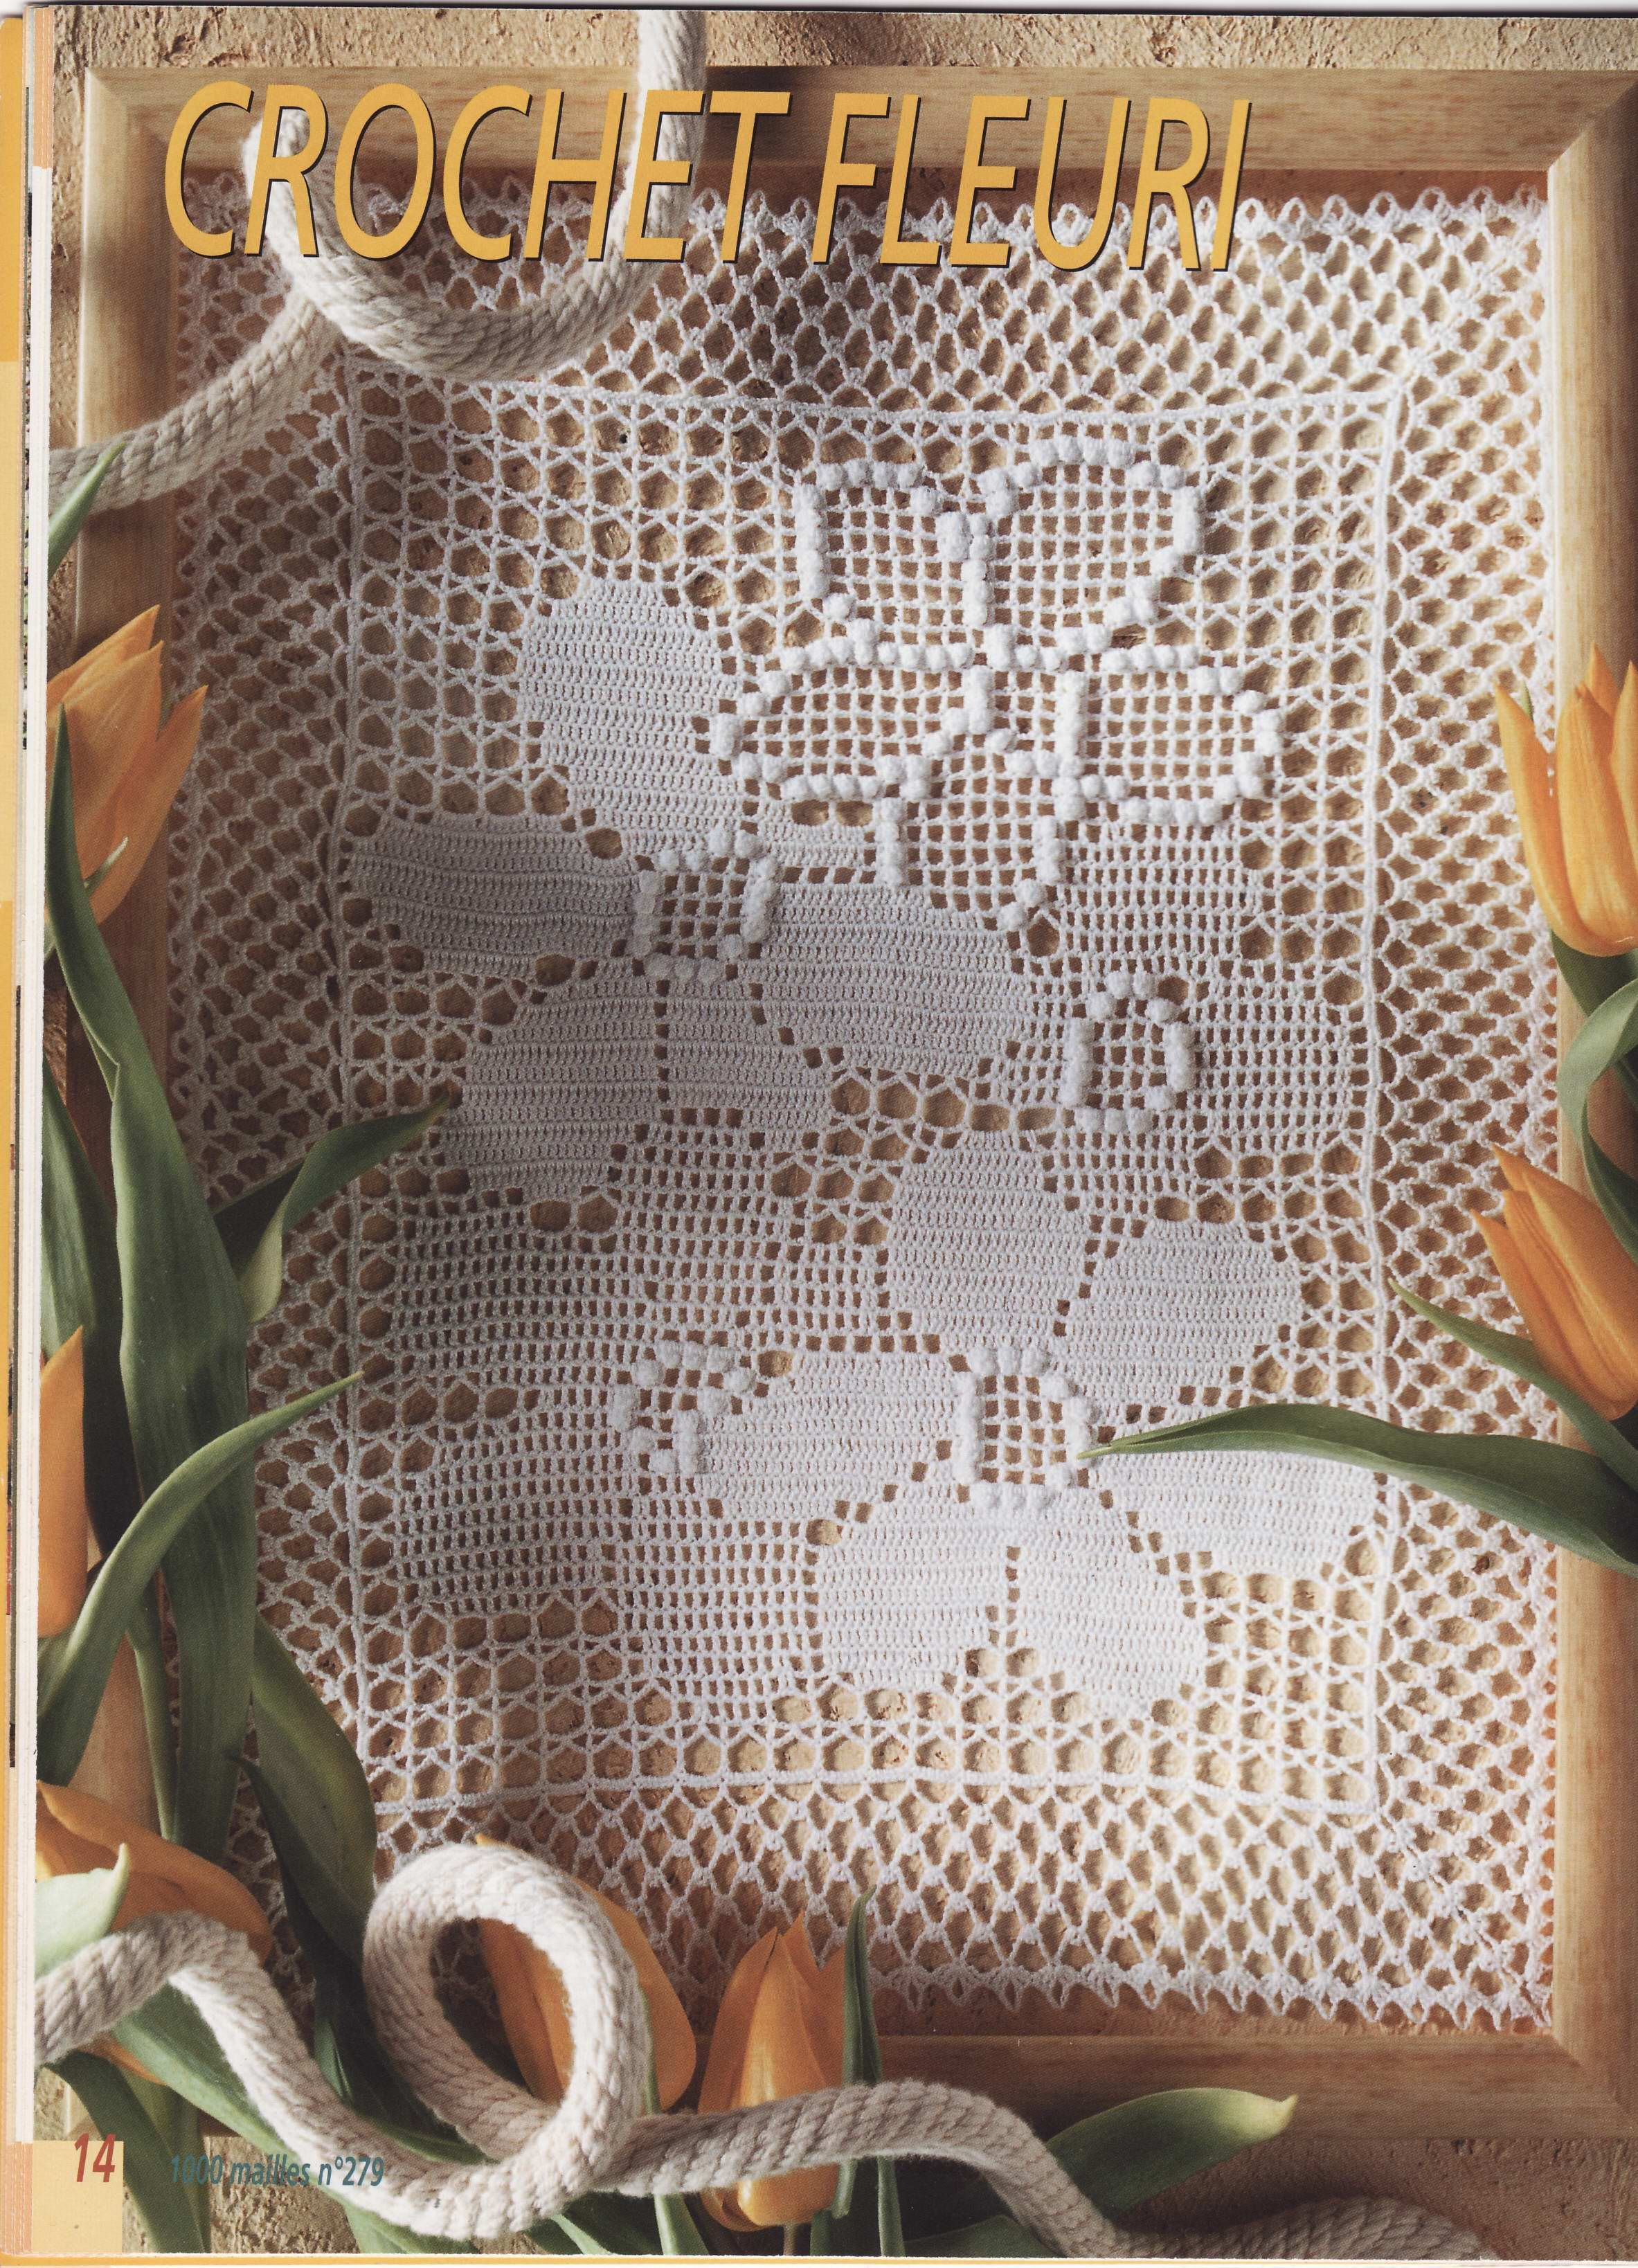 Tischläufer häkeln - crochet tablerunner | Häkeln Tischläufer ...